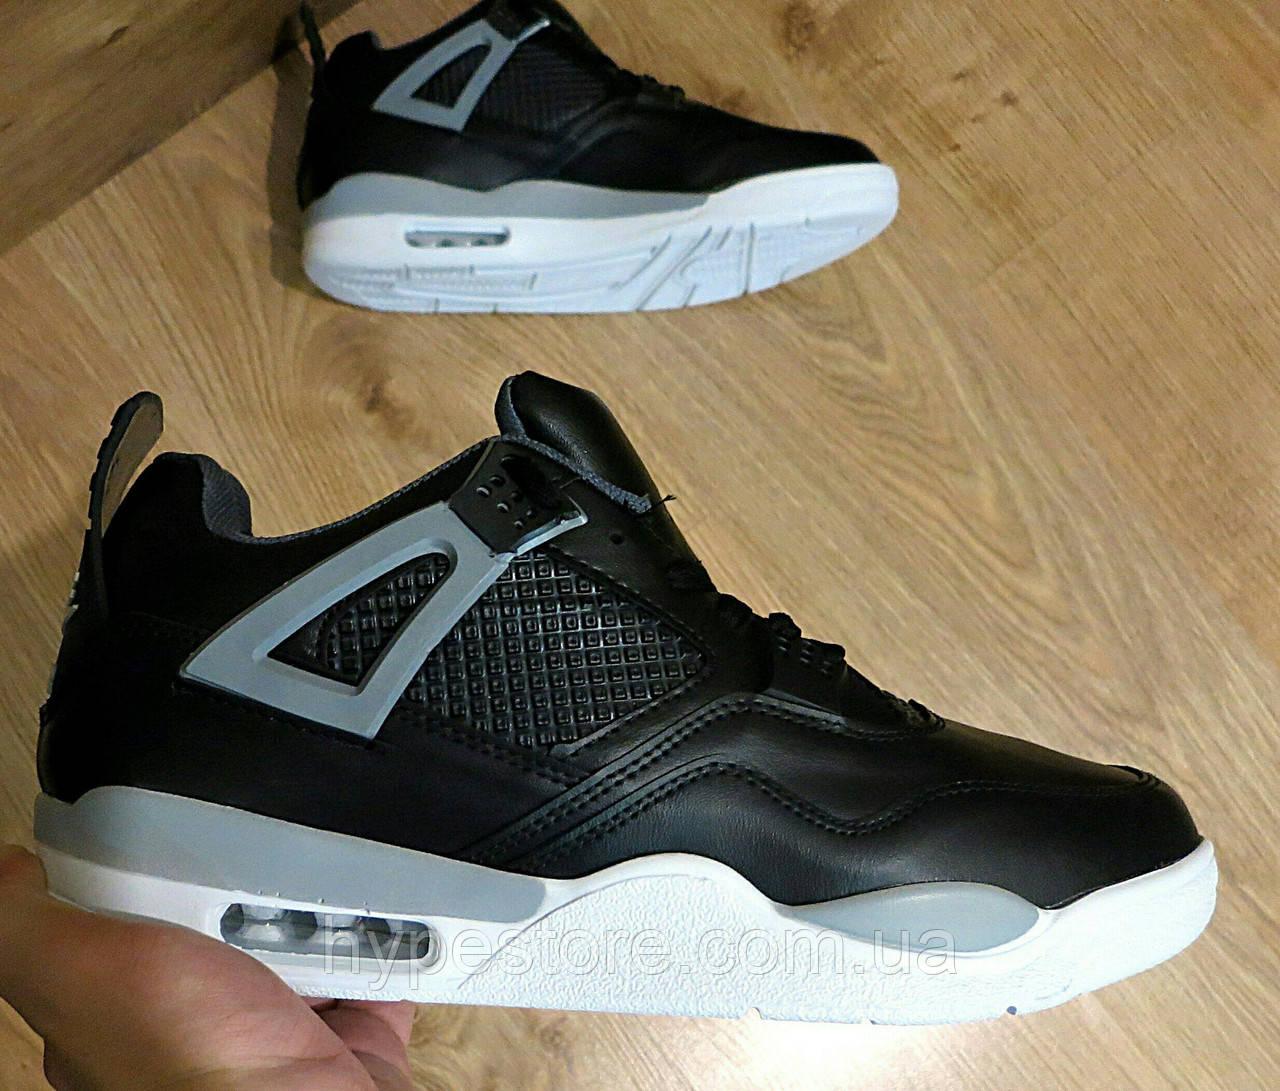 Уценка!!!Кроссовки Nike Air Jordan (найк аир джордан)см.последние фото, Реплика